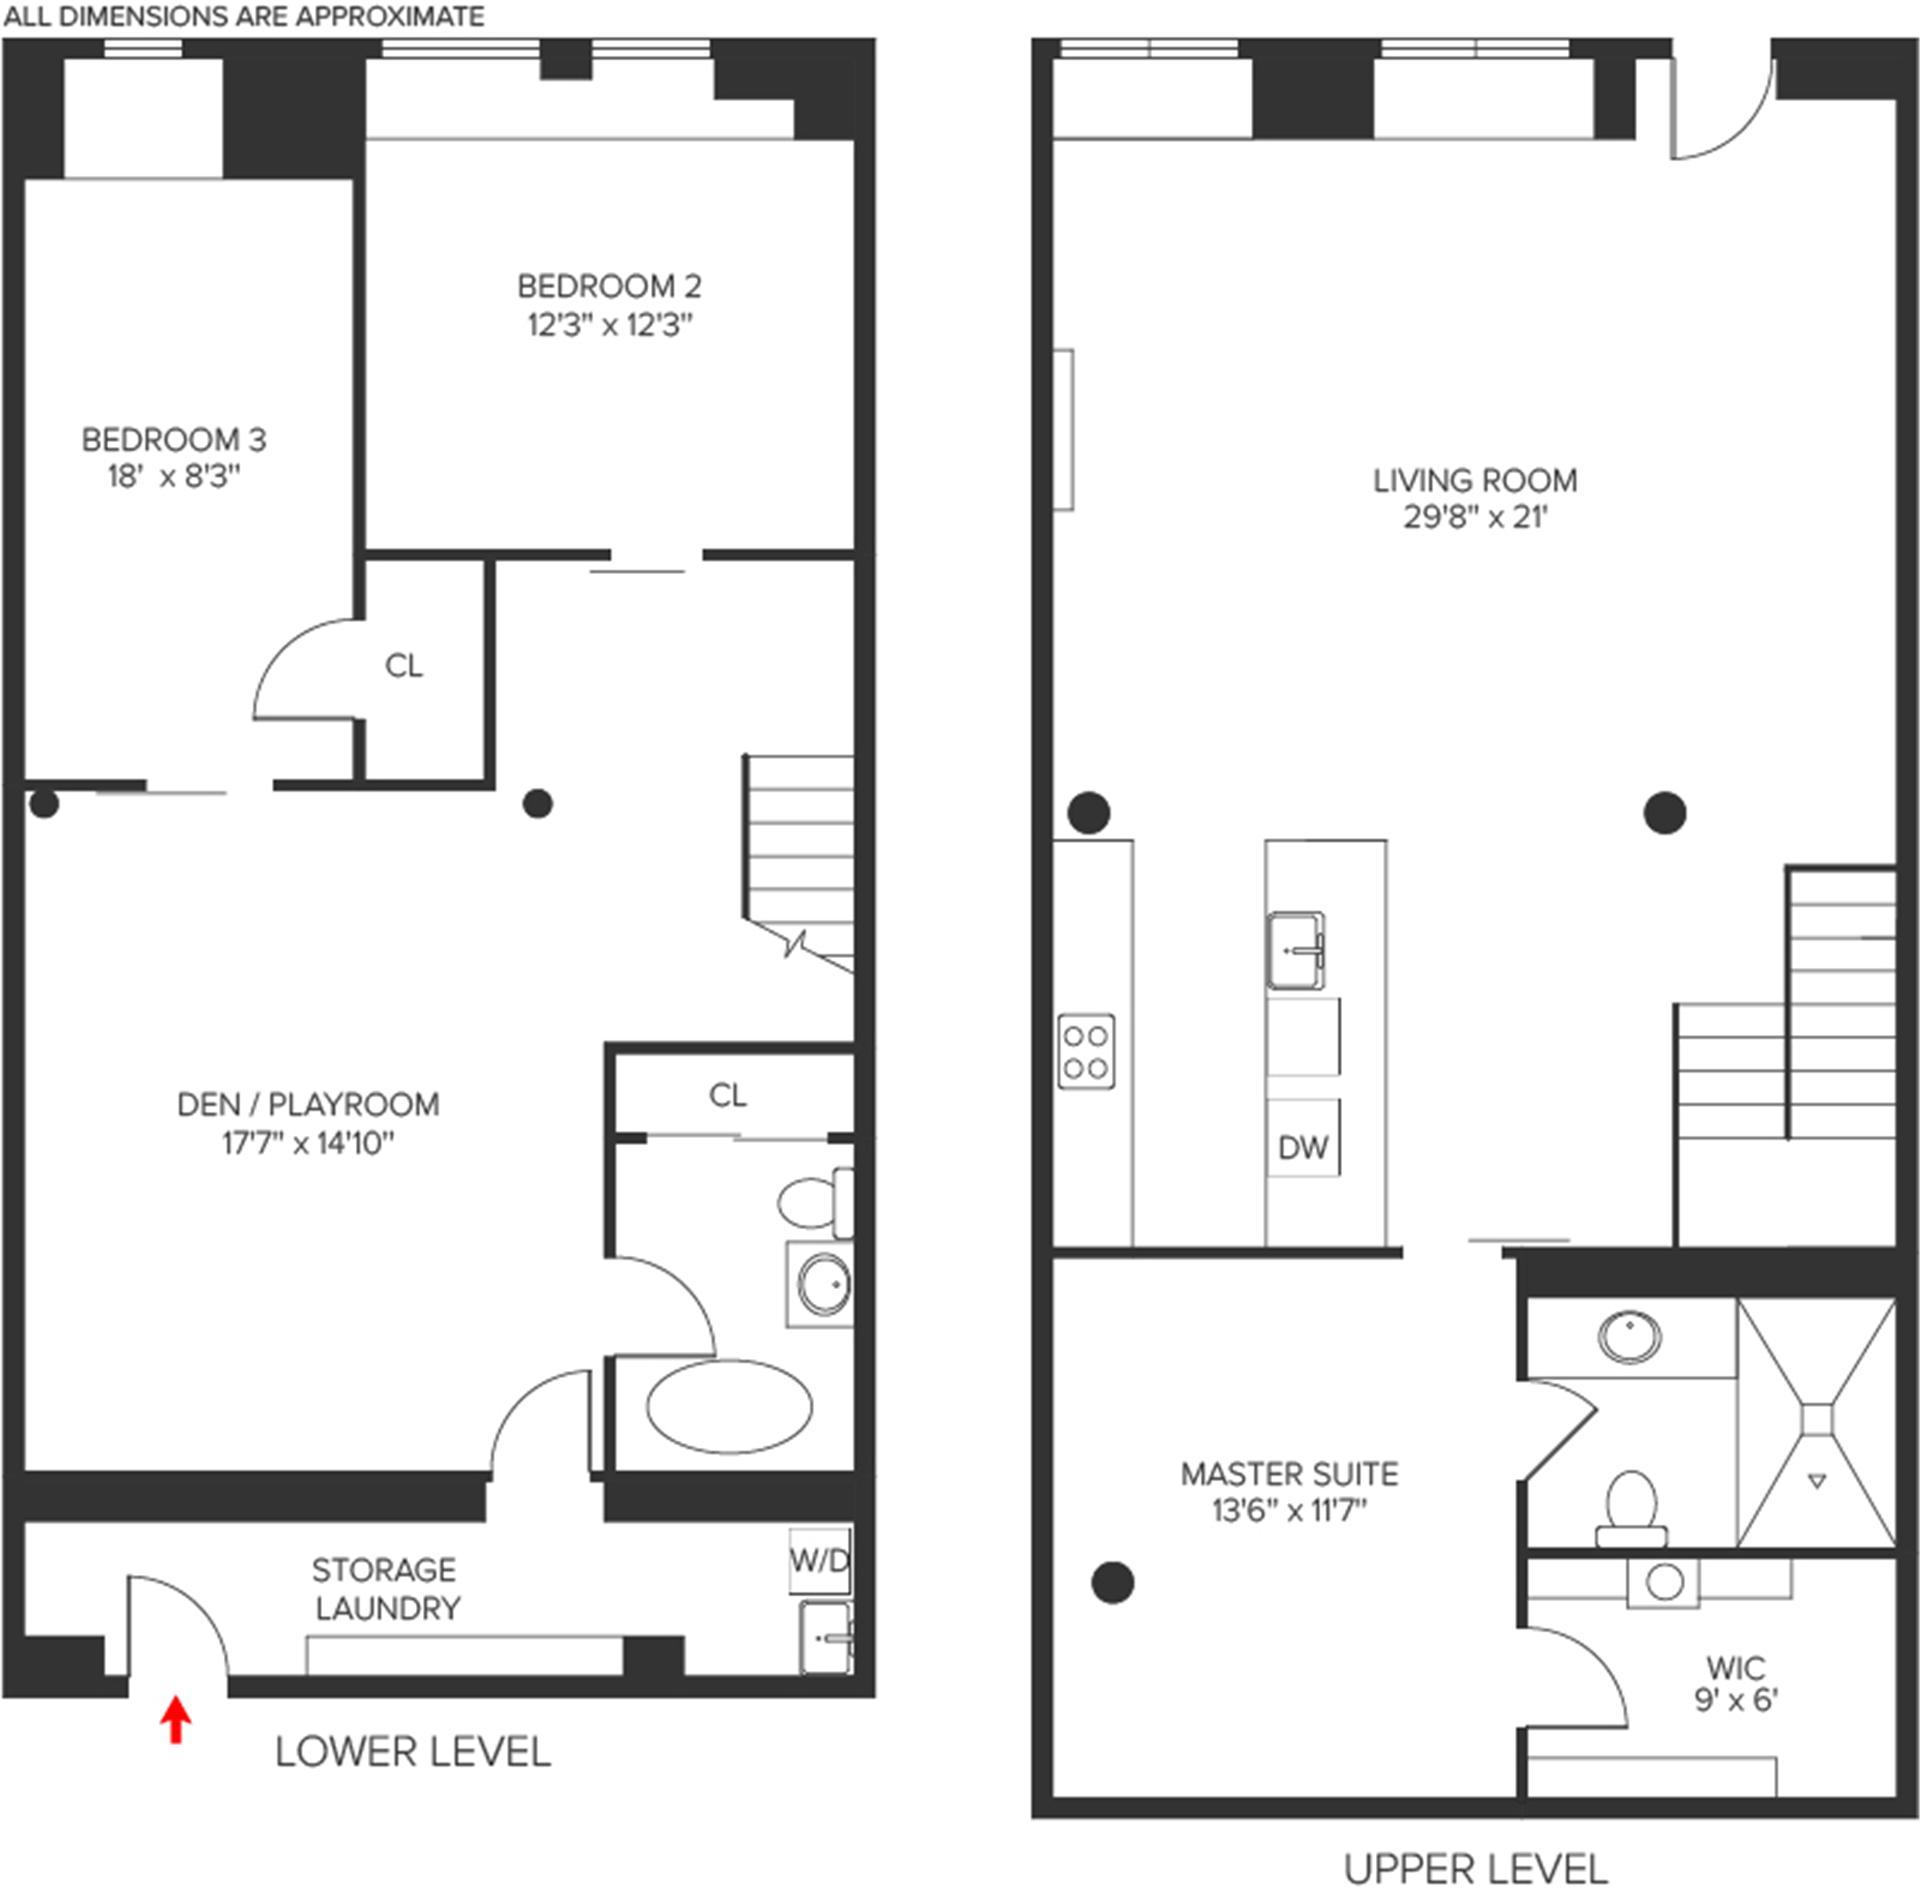 Floor plan of 308 Elizabeth St - NoHo, New York